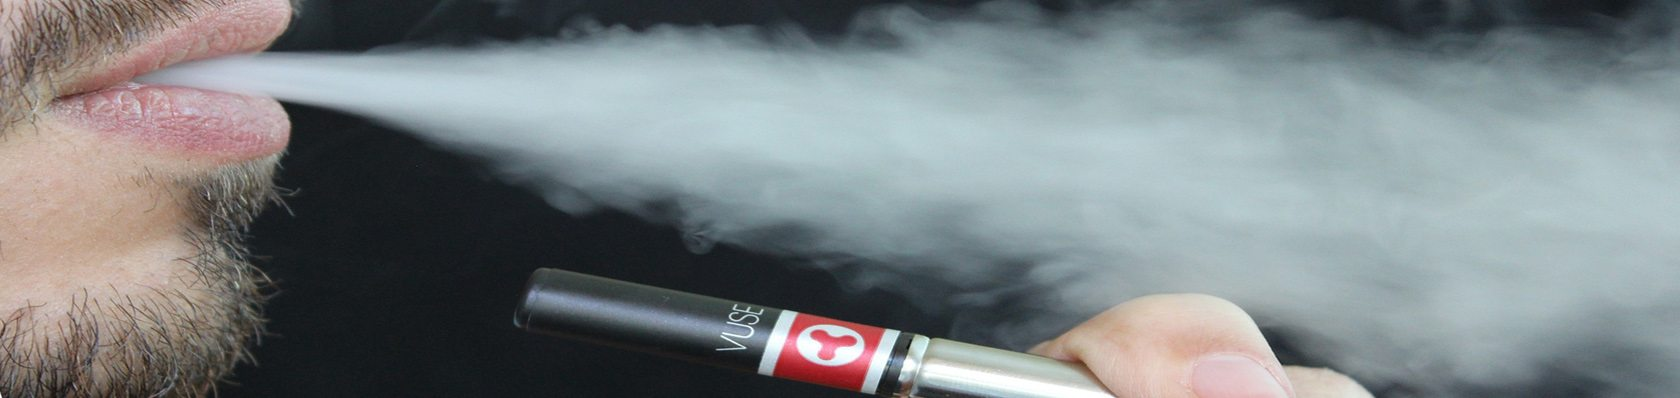 E Zigaretten im Test auf ExpertenTesten.de